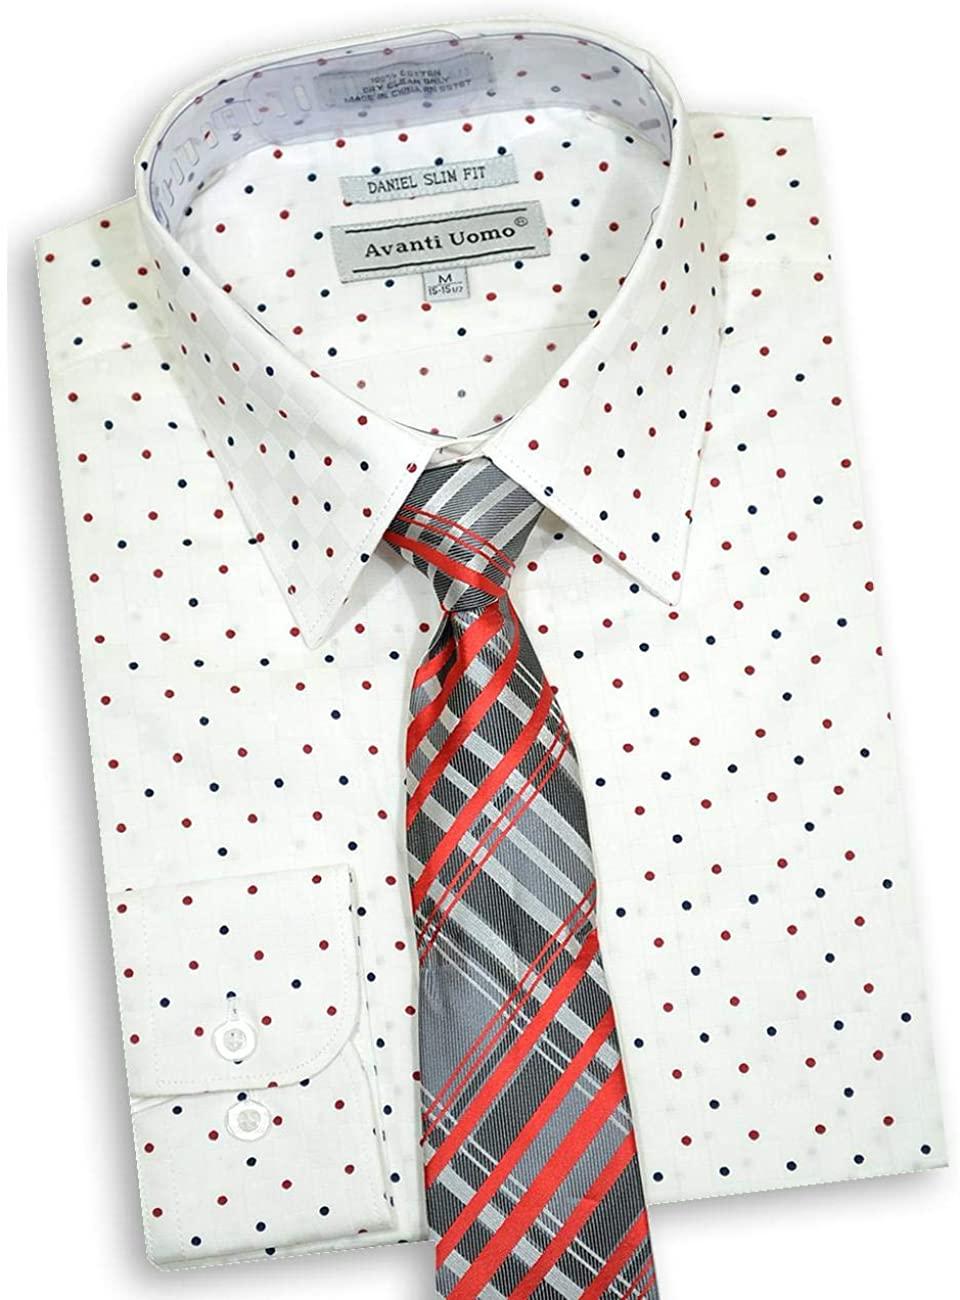 Avanti Uomo Men's White Long Sleeve Slim Fit Dress Shirt with Tie DNS10